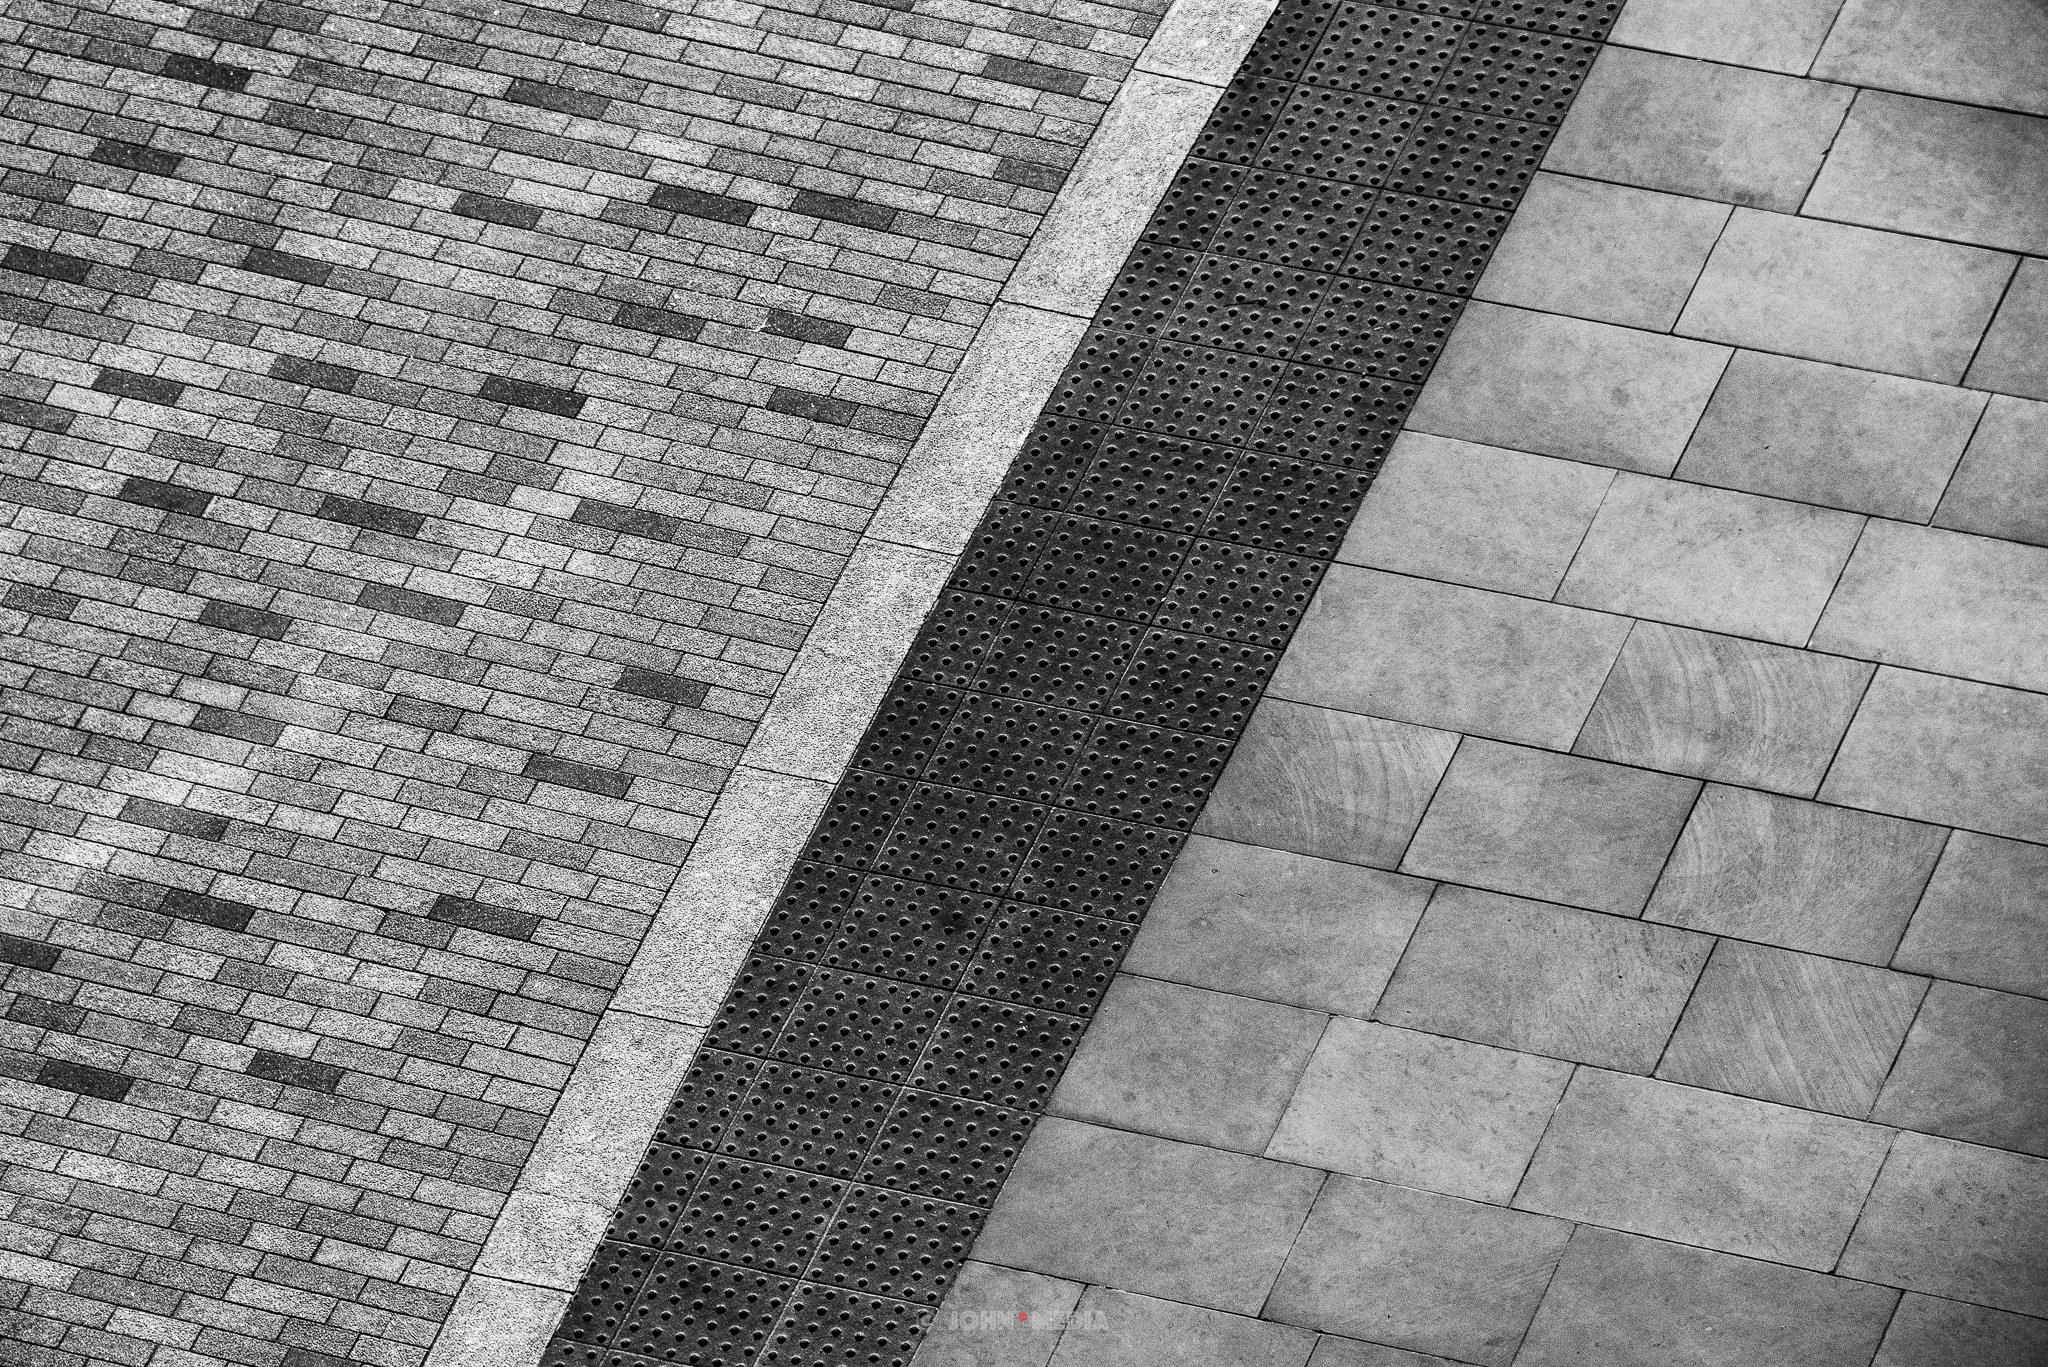 London textures